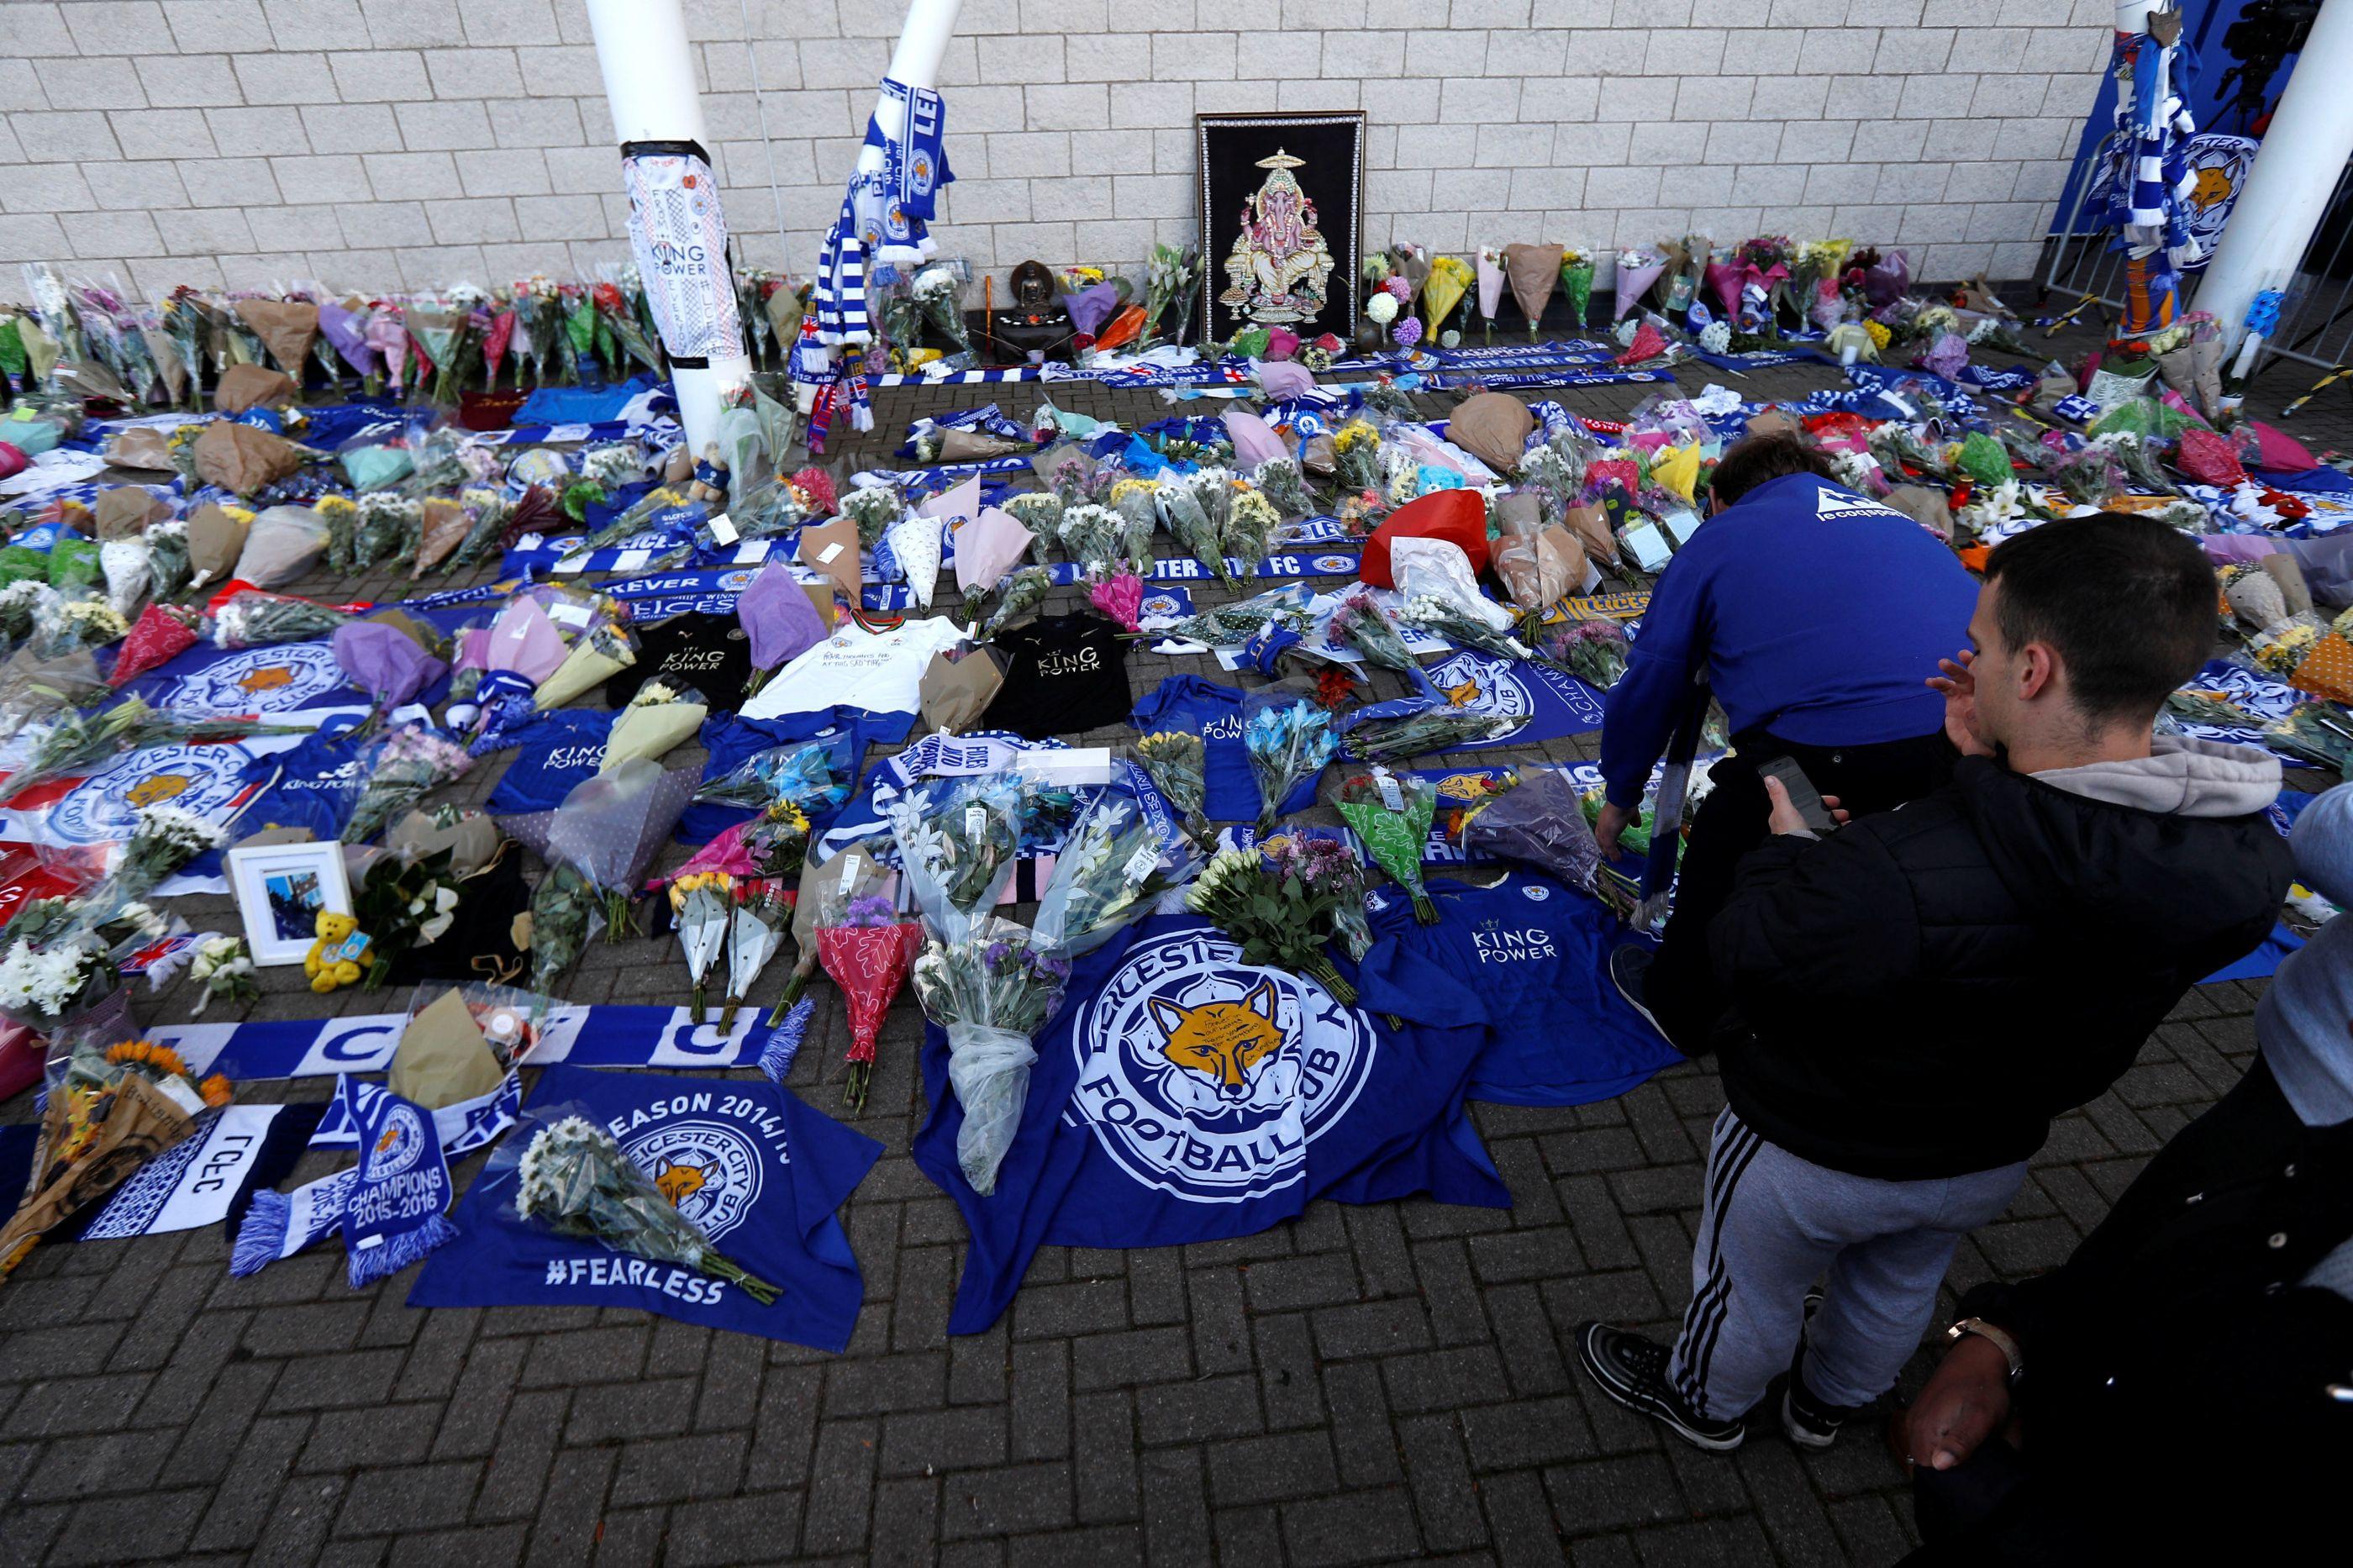 Adeptos do Leicester deixaram flores e lágrimas junto ao estádio